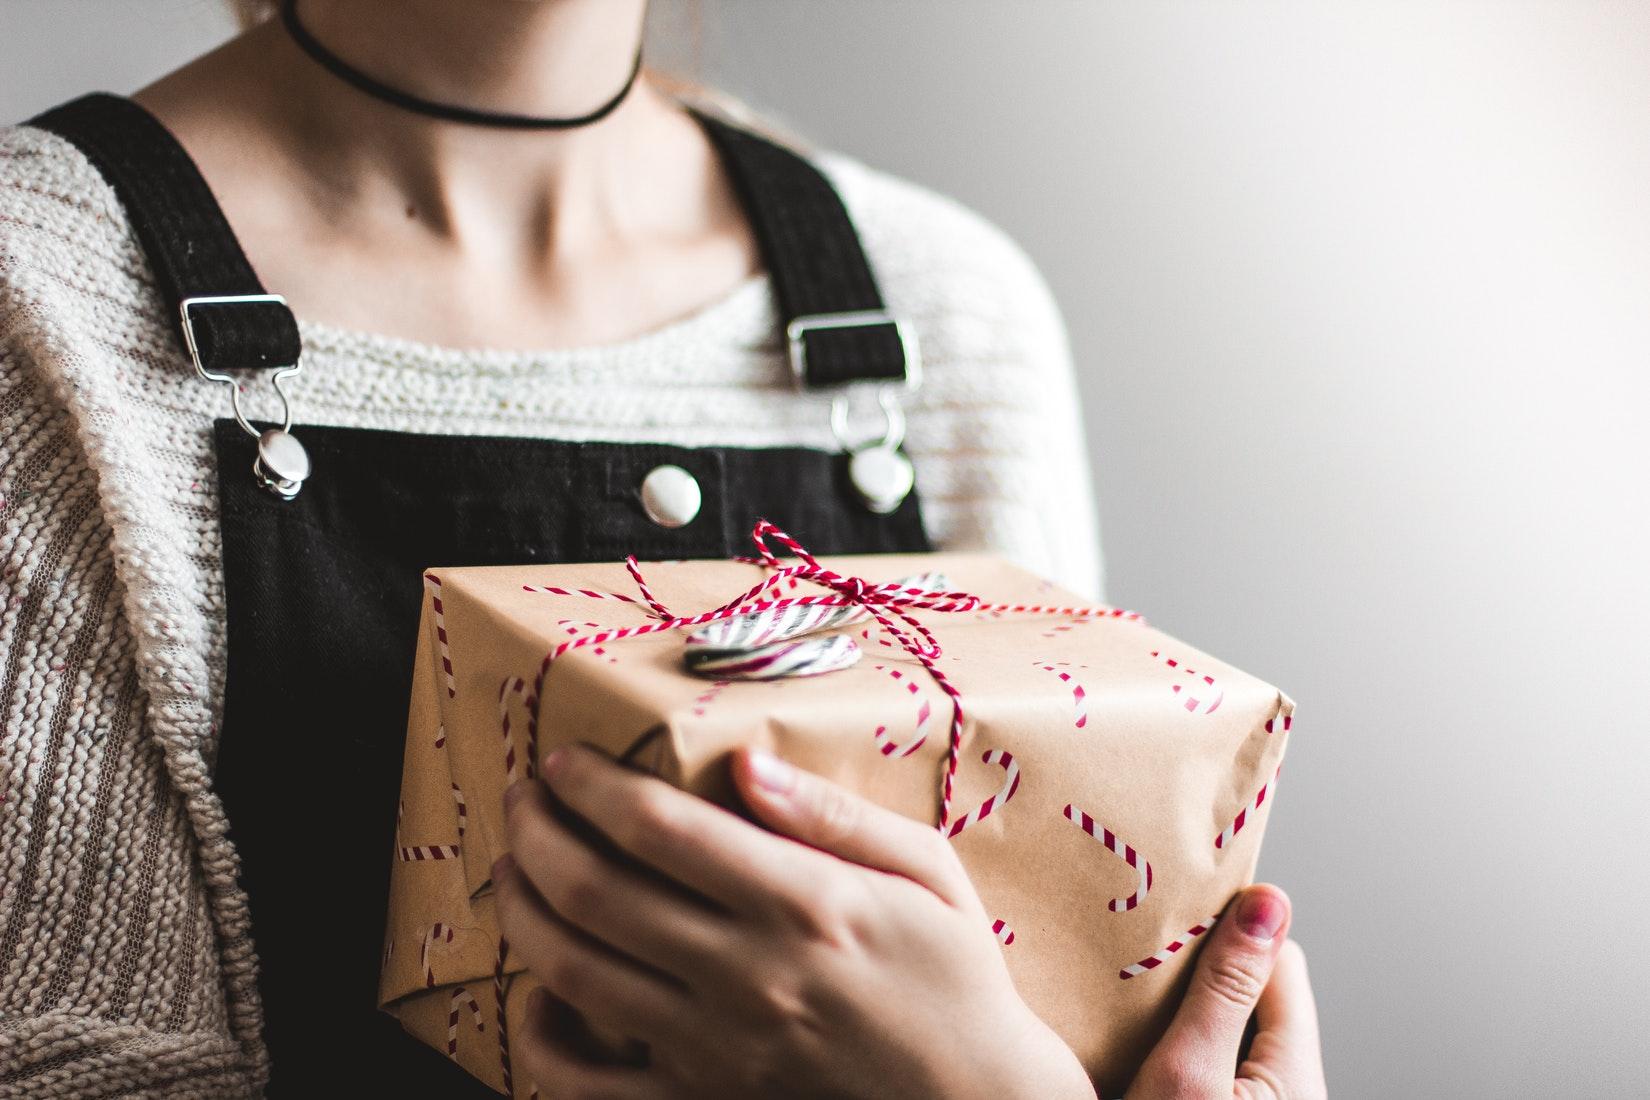 Талисман на счастье. 3 подарка, притягивающих удачу и богатство